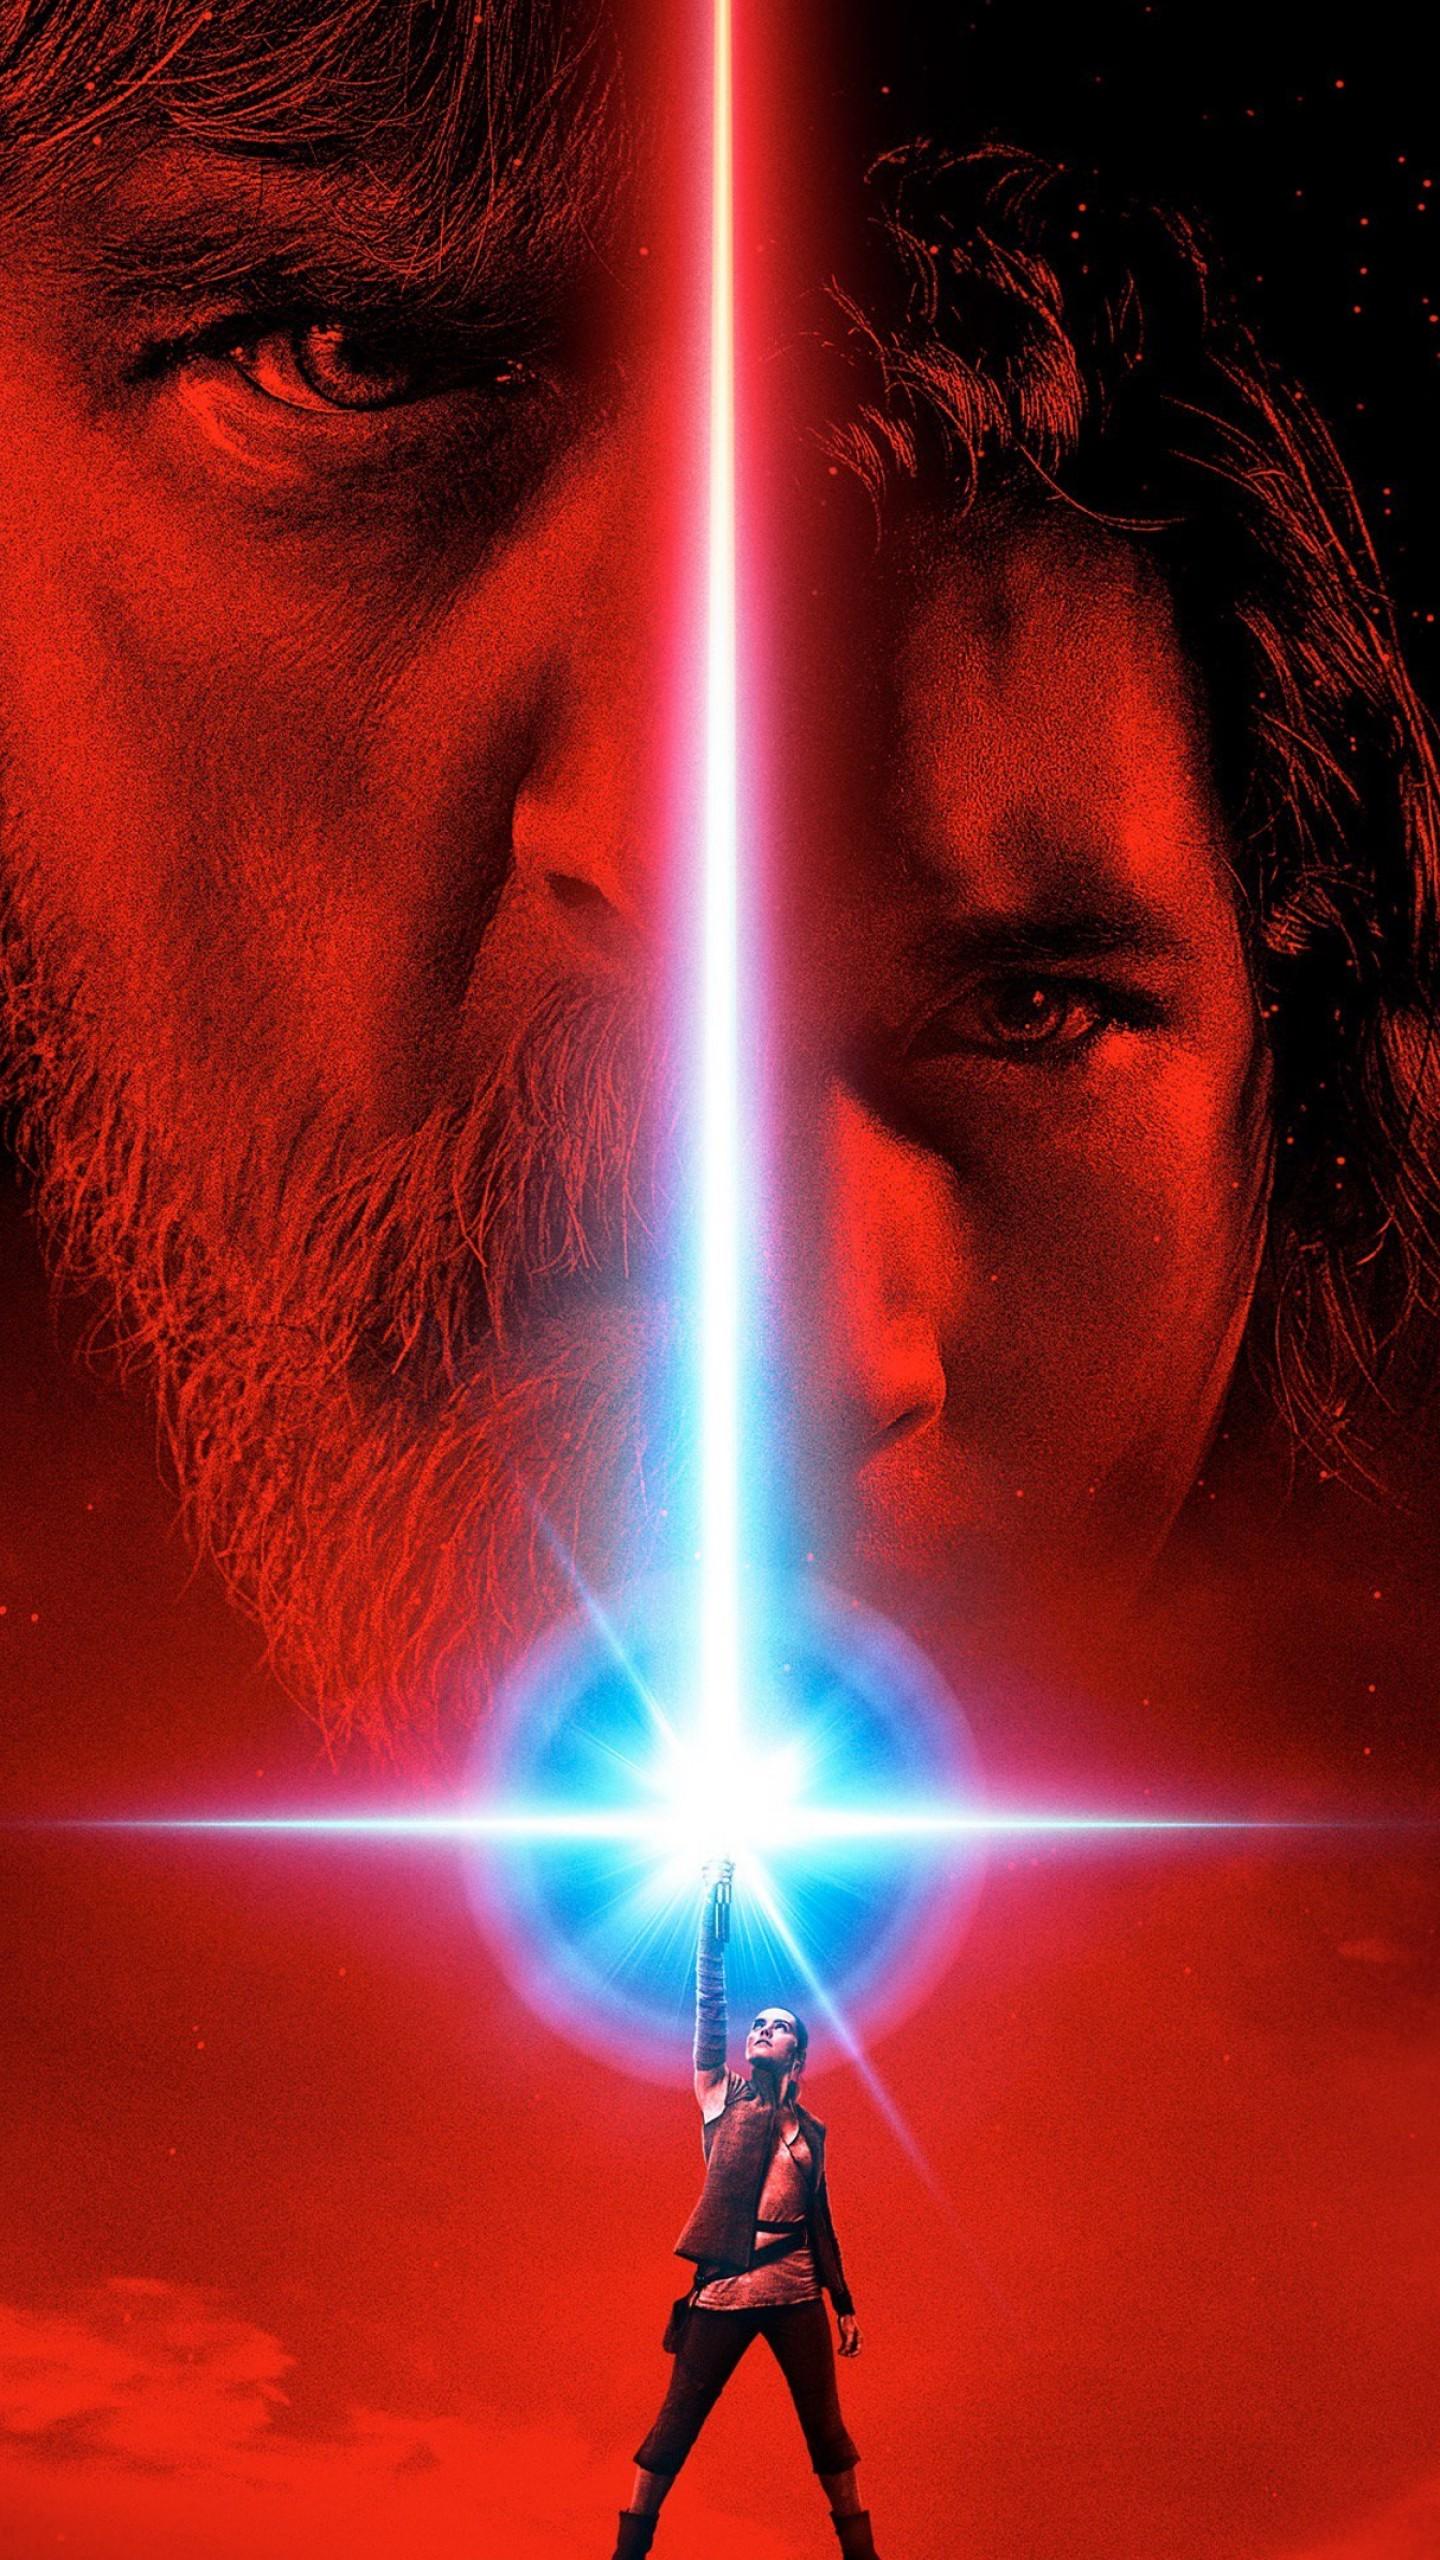 Wallpaper Star Wars The Last Jedi Poster Mark Hamill Daisy